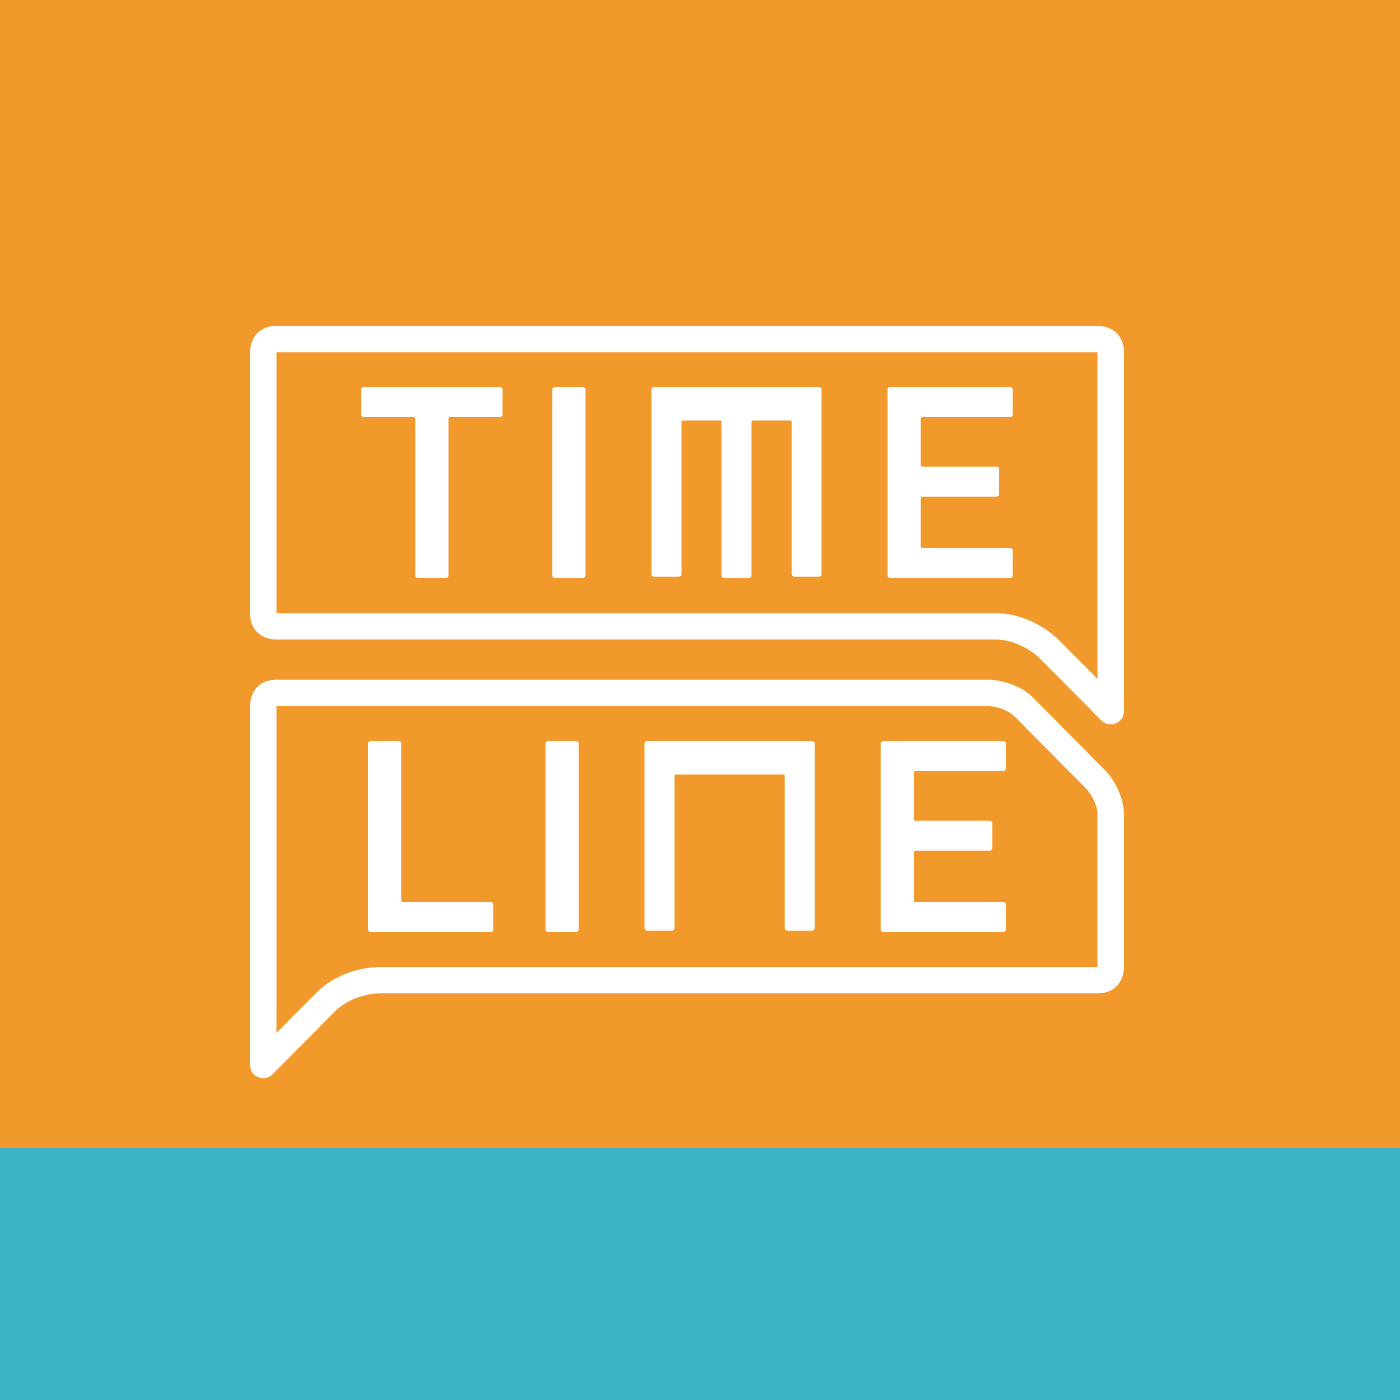 Timeline Gaúcha 19/07/2017